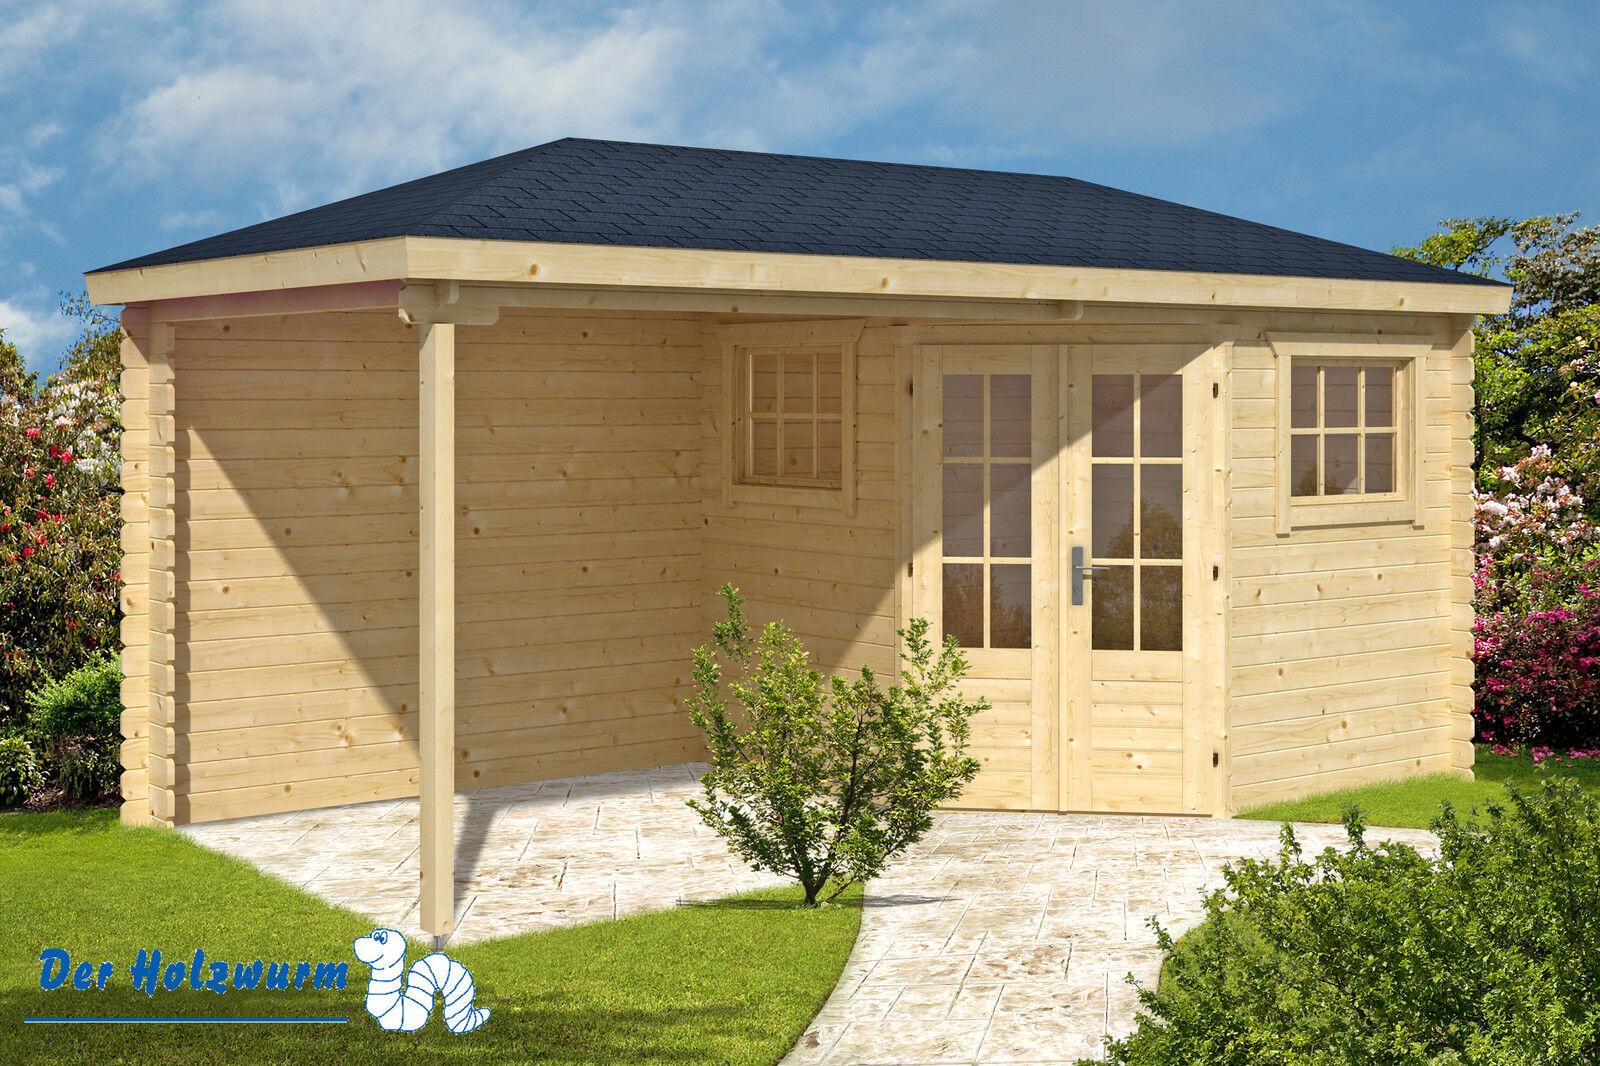 28 mm gartenhaus rianne ca 500 x 250 cm blockh tte ger tehaus holzhaus schuppen. Black Bedroom Furniture Sets. Home Design Ideas